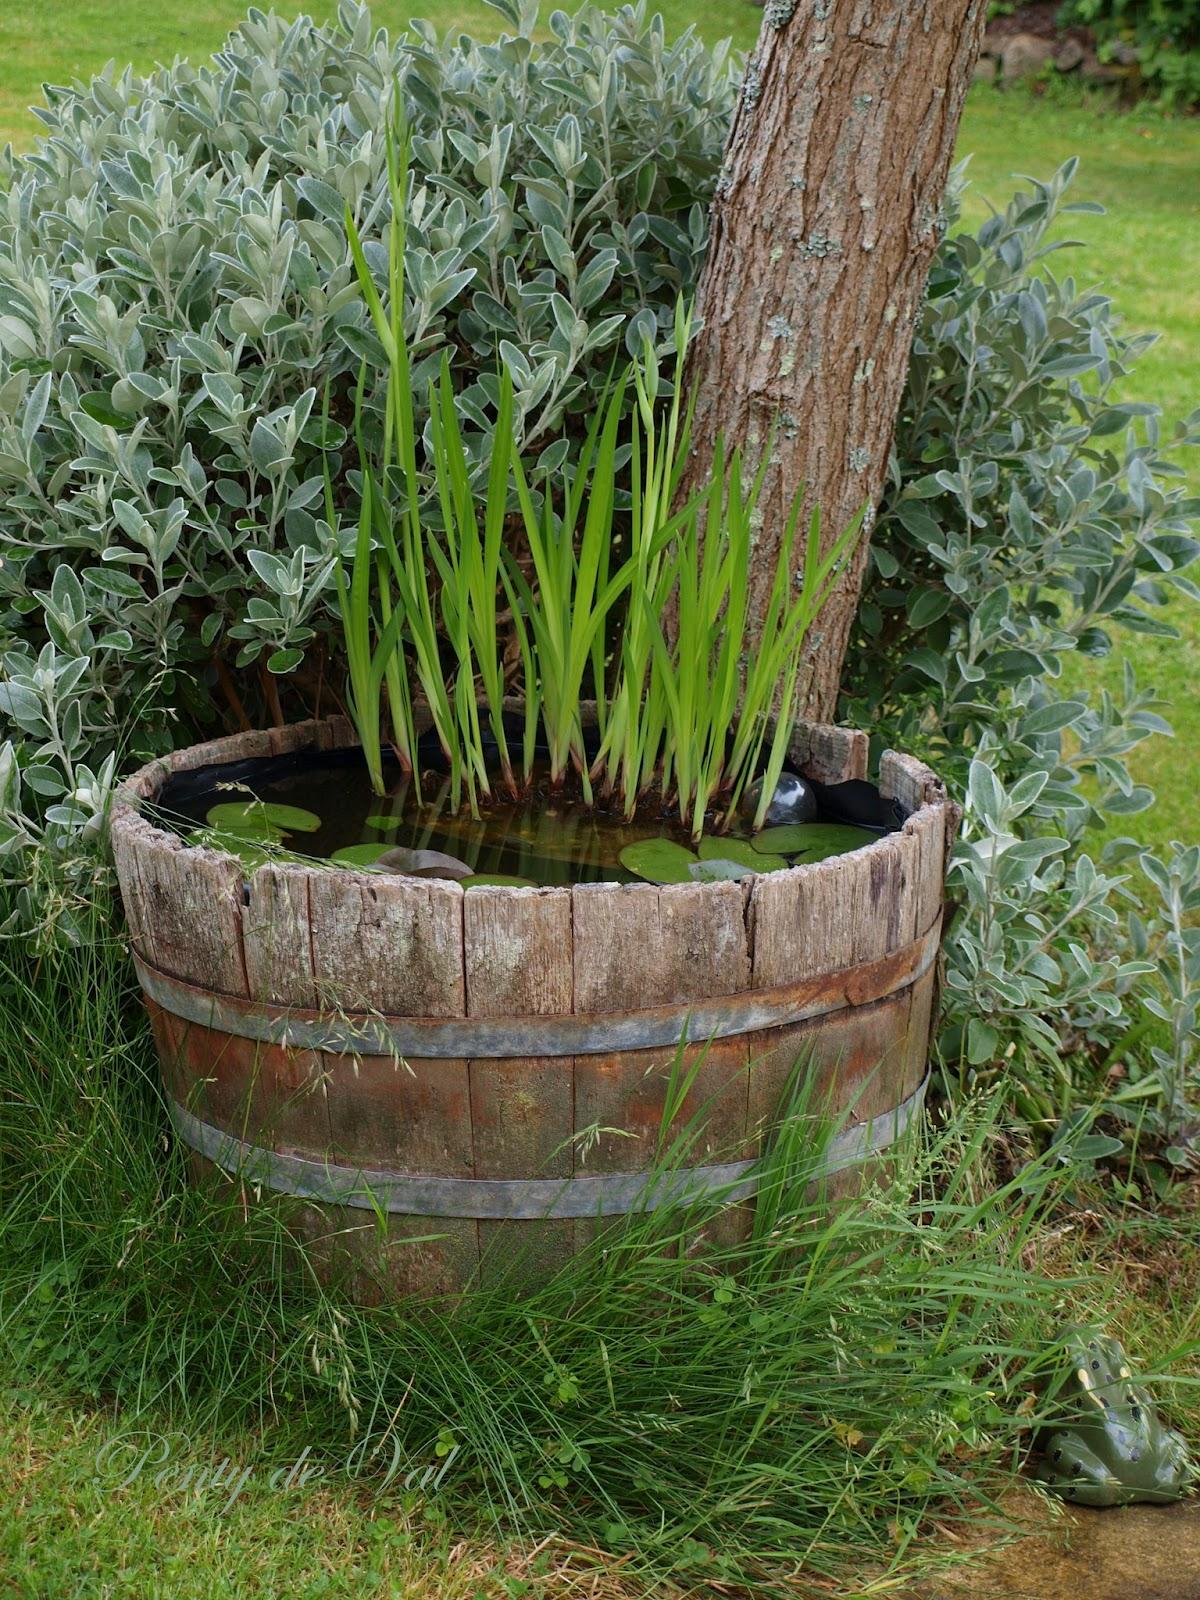 penty de val un mini bassin tonneau dans le jardin. Black Bedroom Furniture Sets. Home Design Ideas